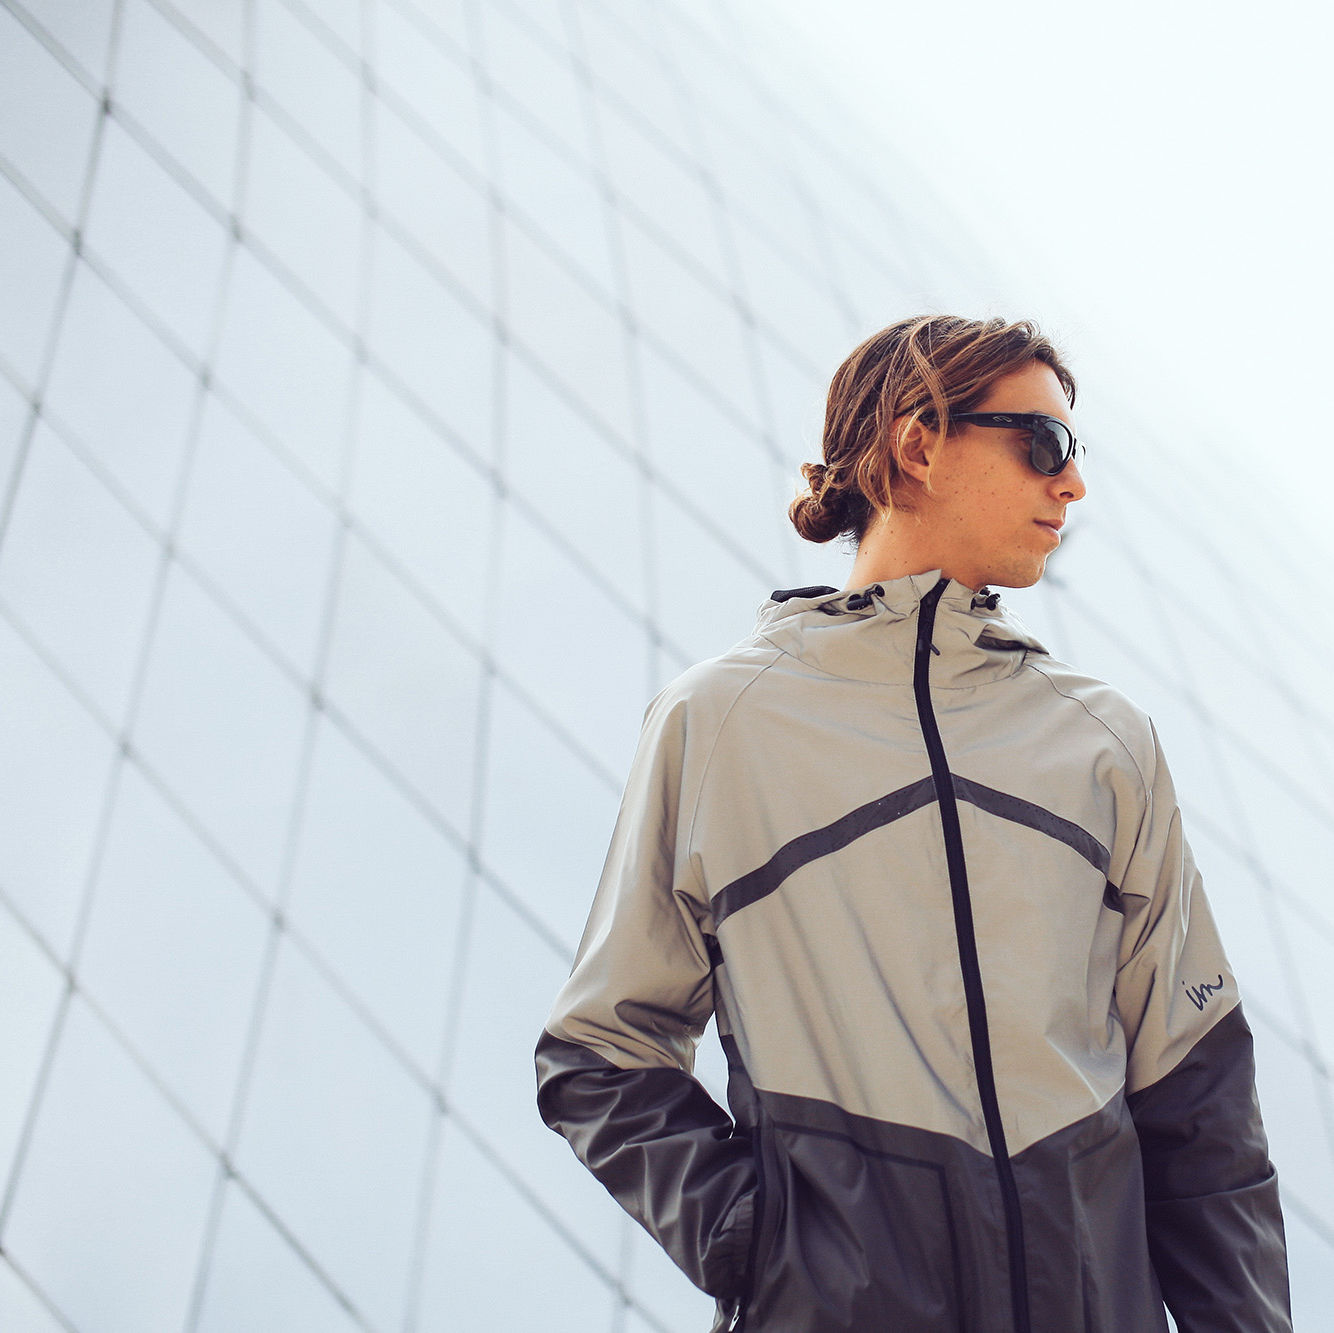 Theory reflective jacket nuskdh